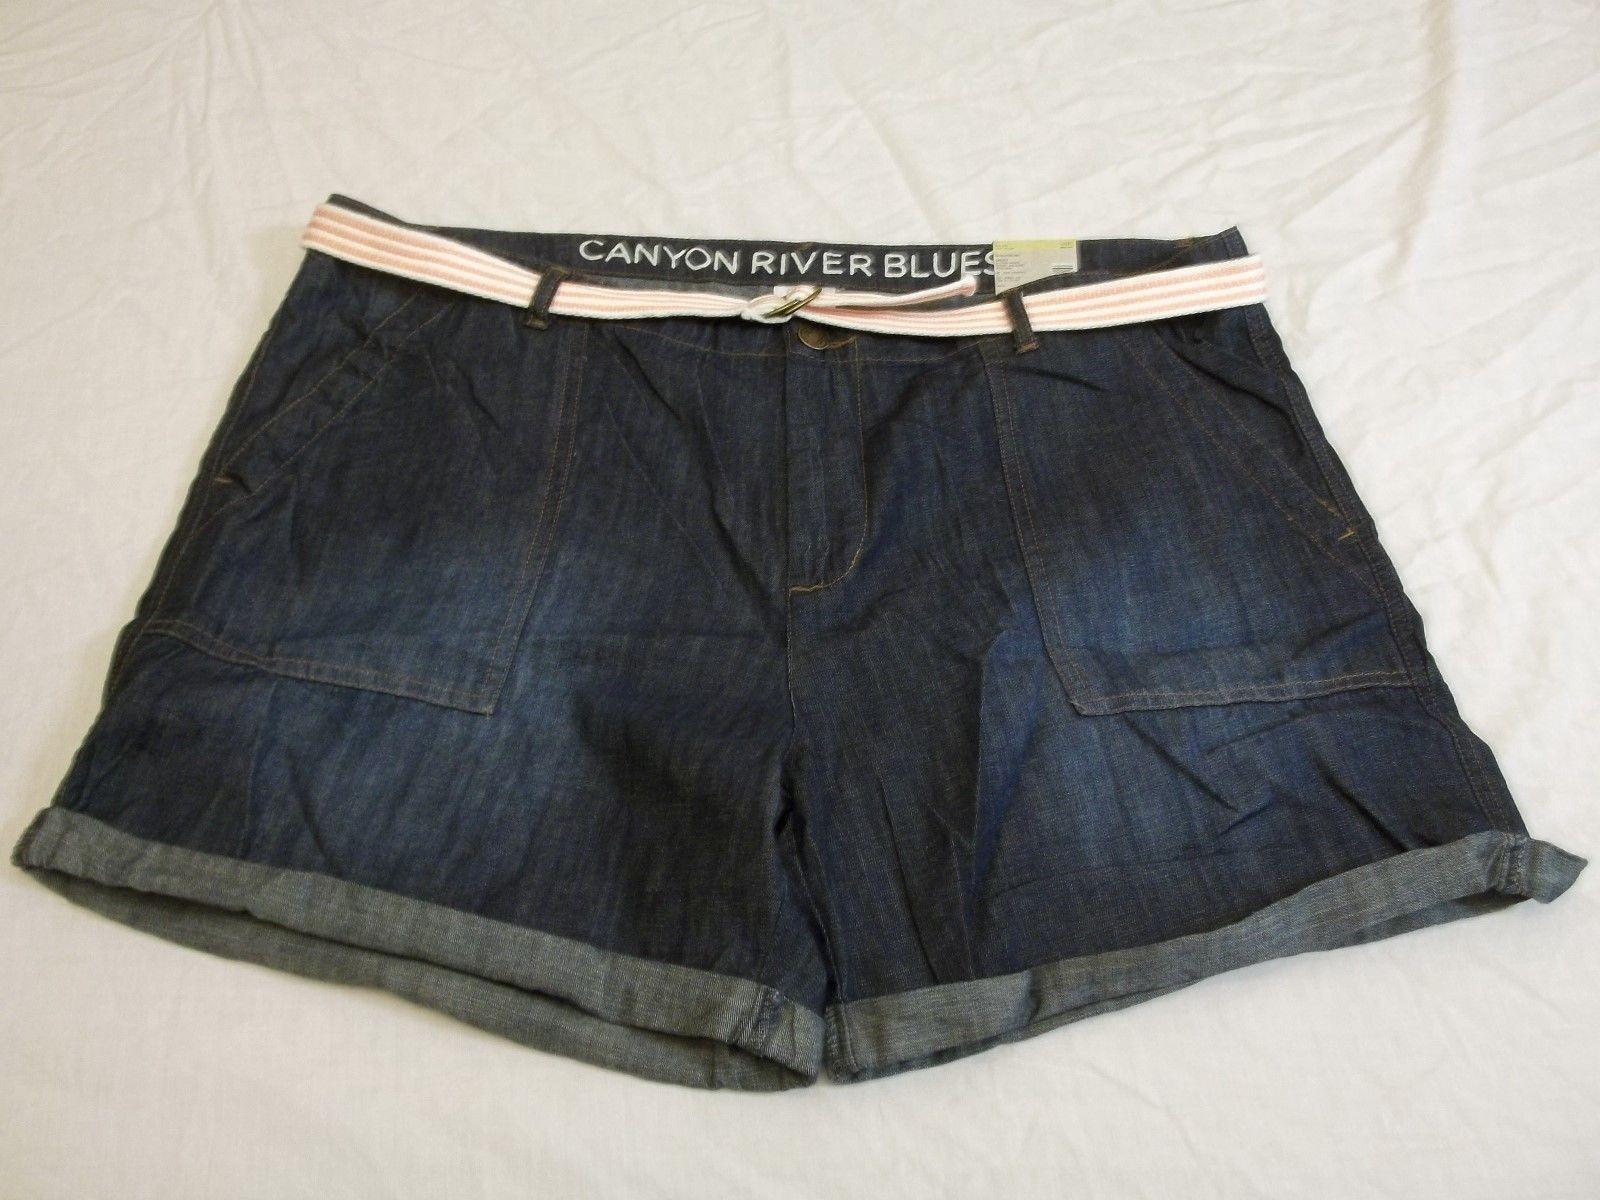 Women's Missy Canyon River Blues Size 16 Cuffed Jean Shorts W Pink Belt NEW - $21.77